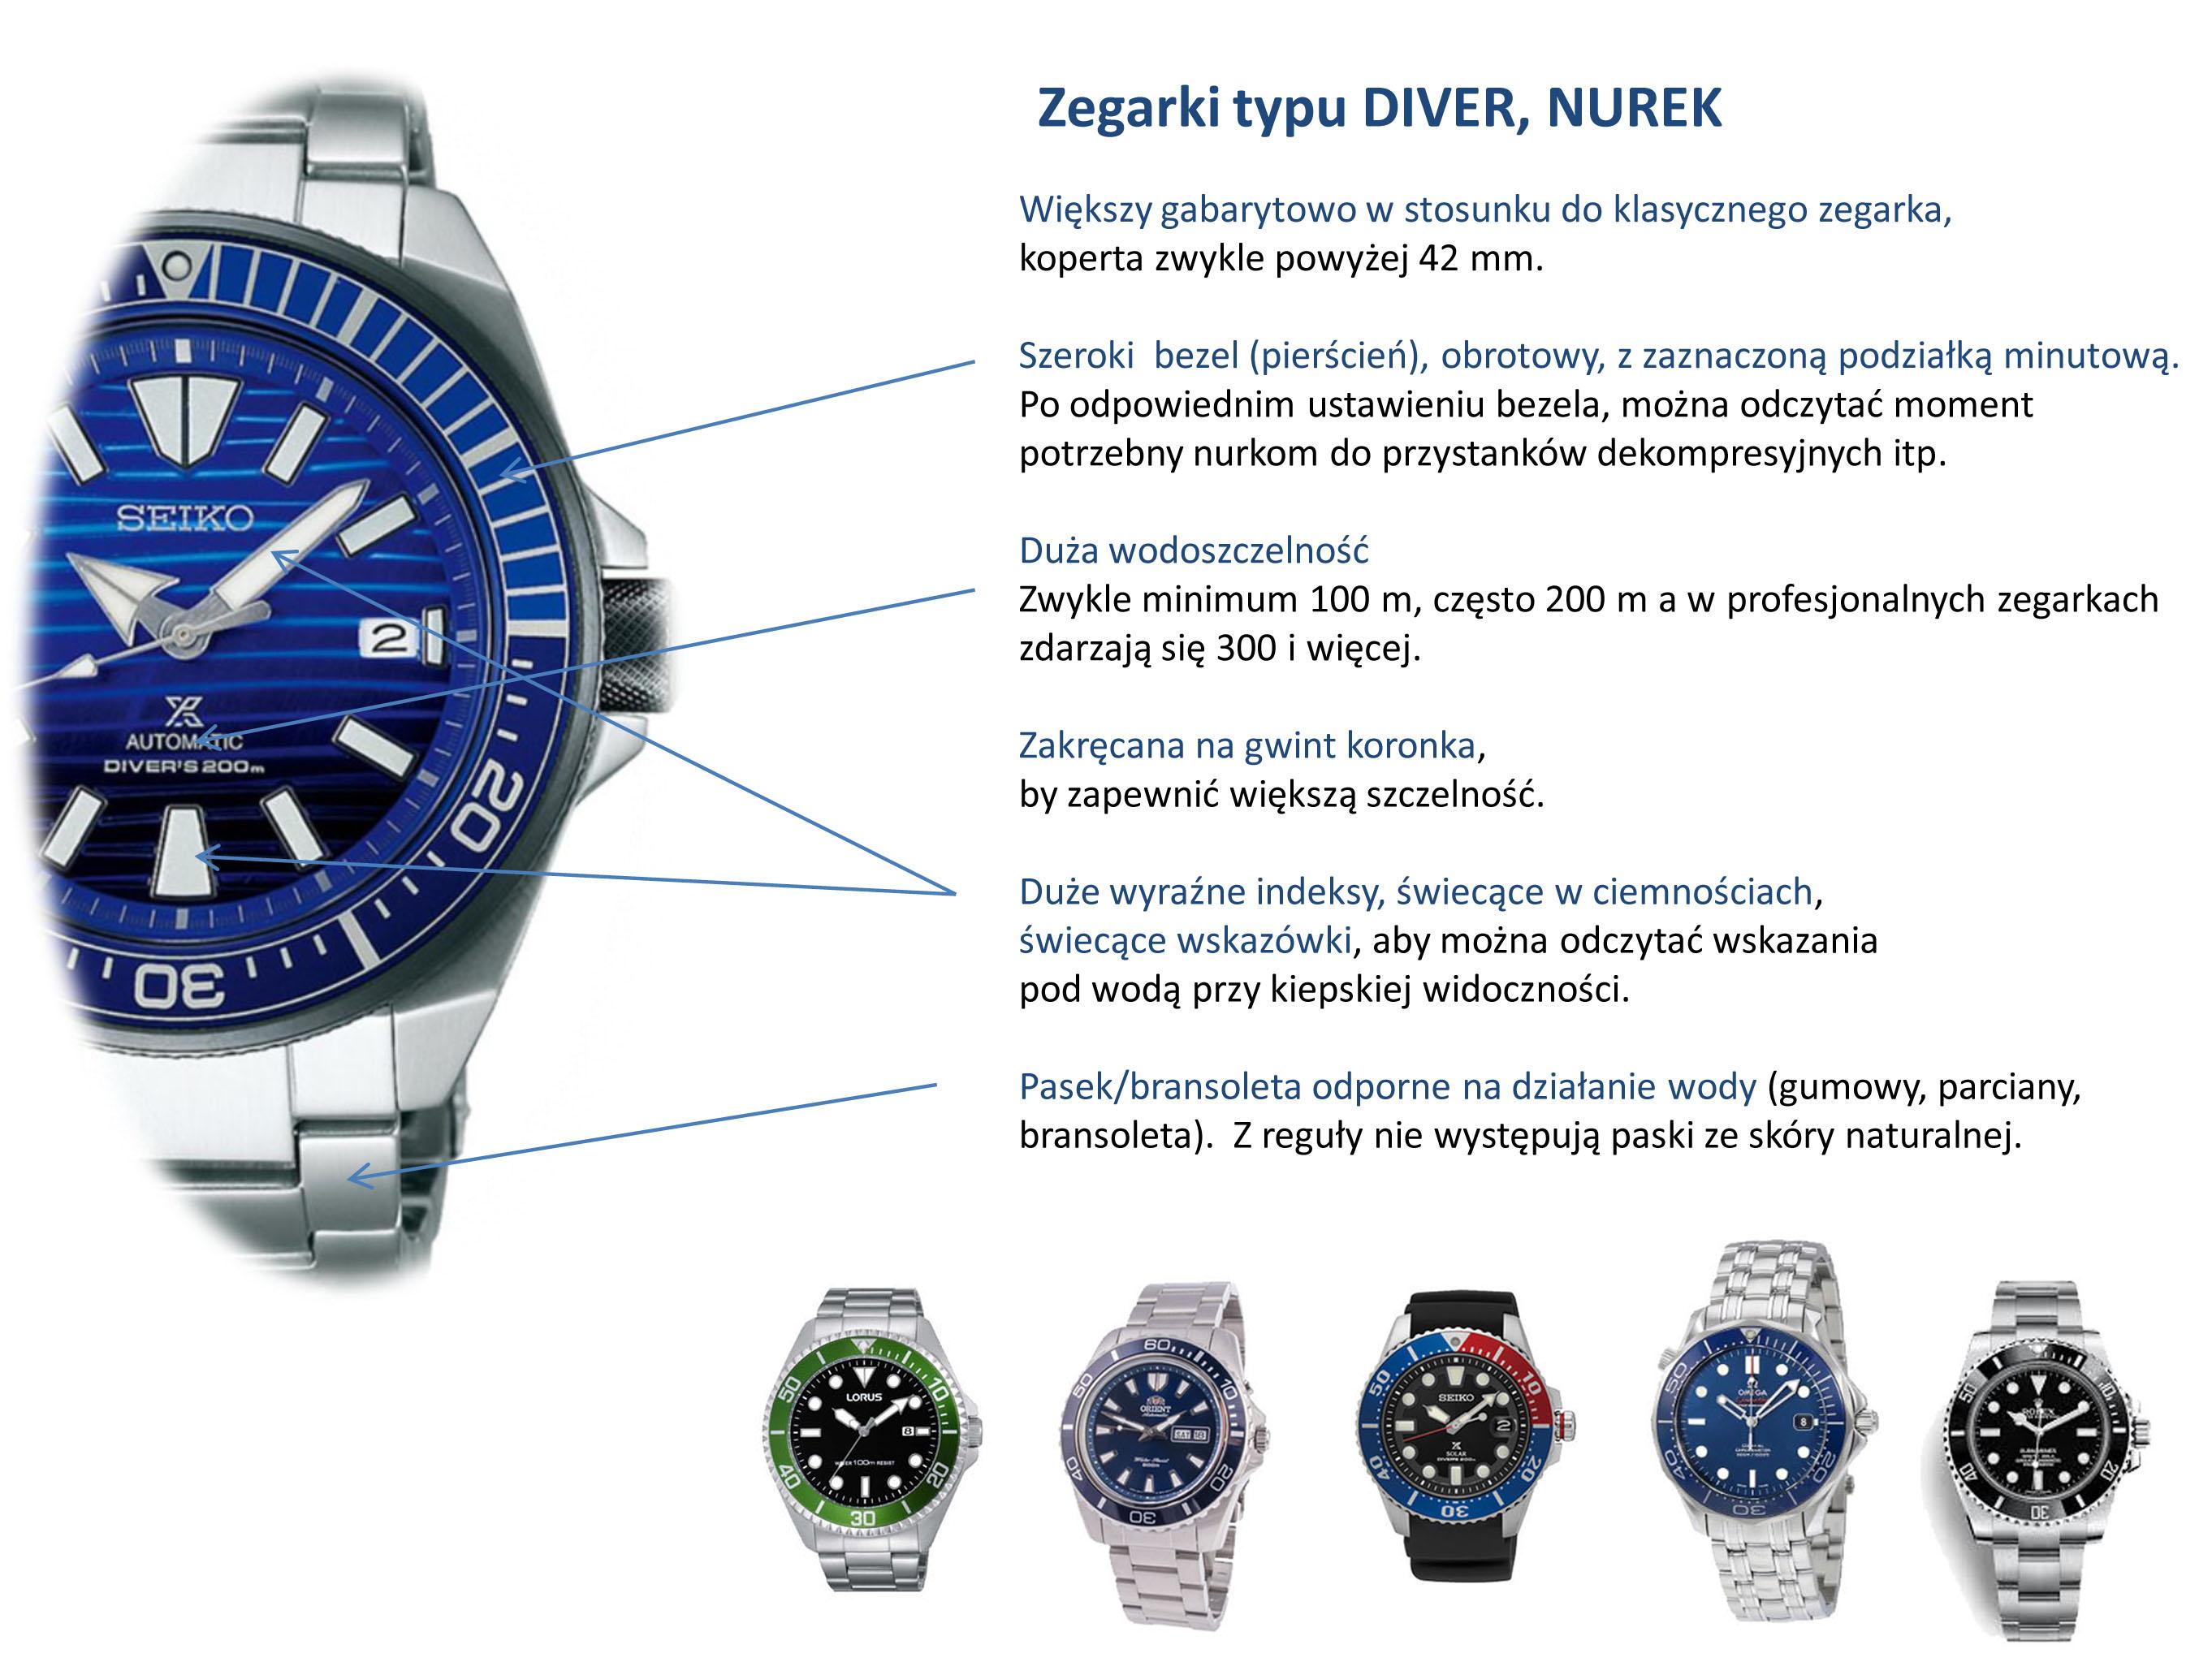 Zegarki typu nurek diver